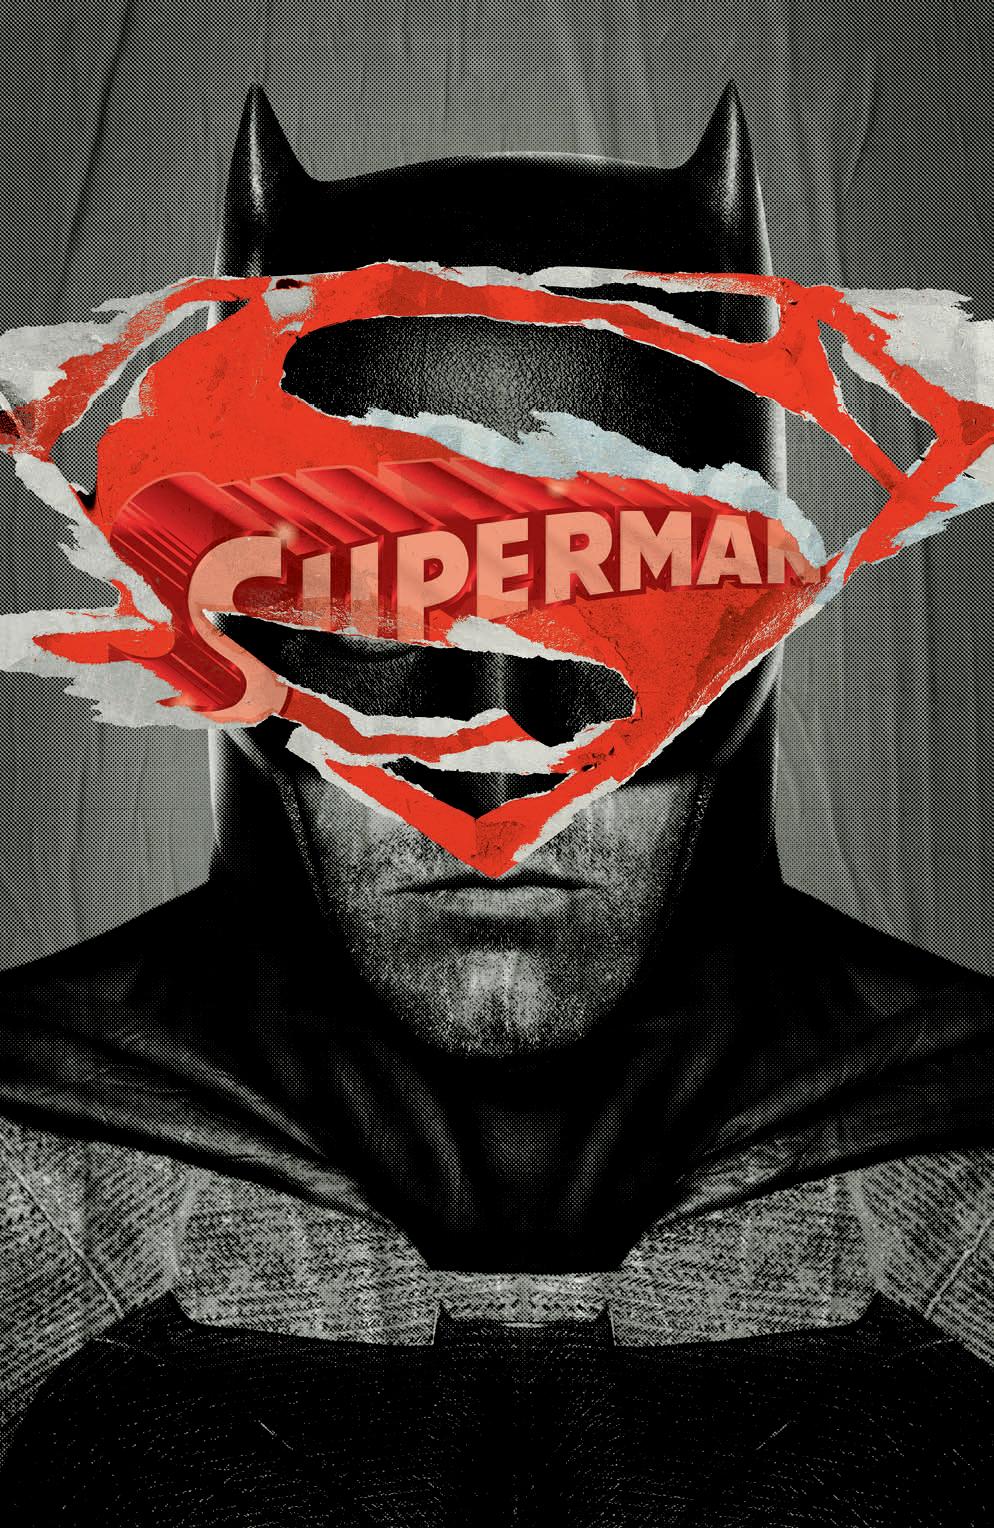 SUPERMAN #50 black polybag artwork